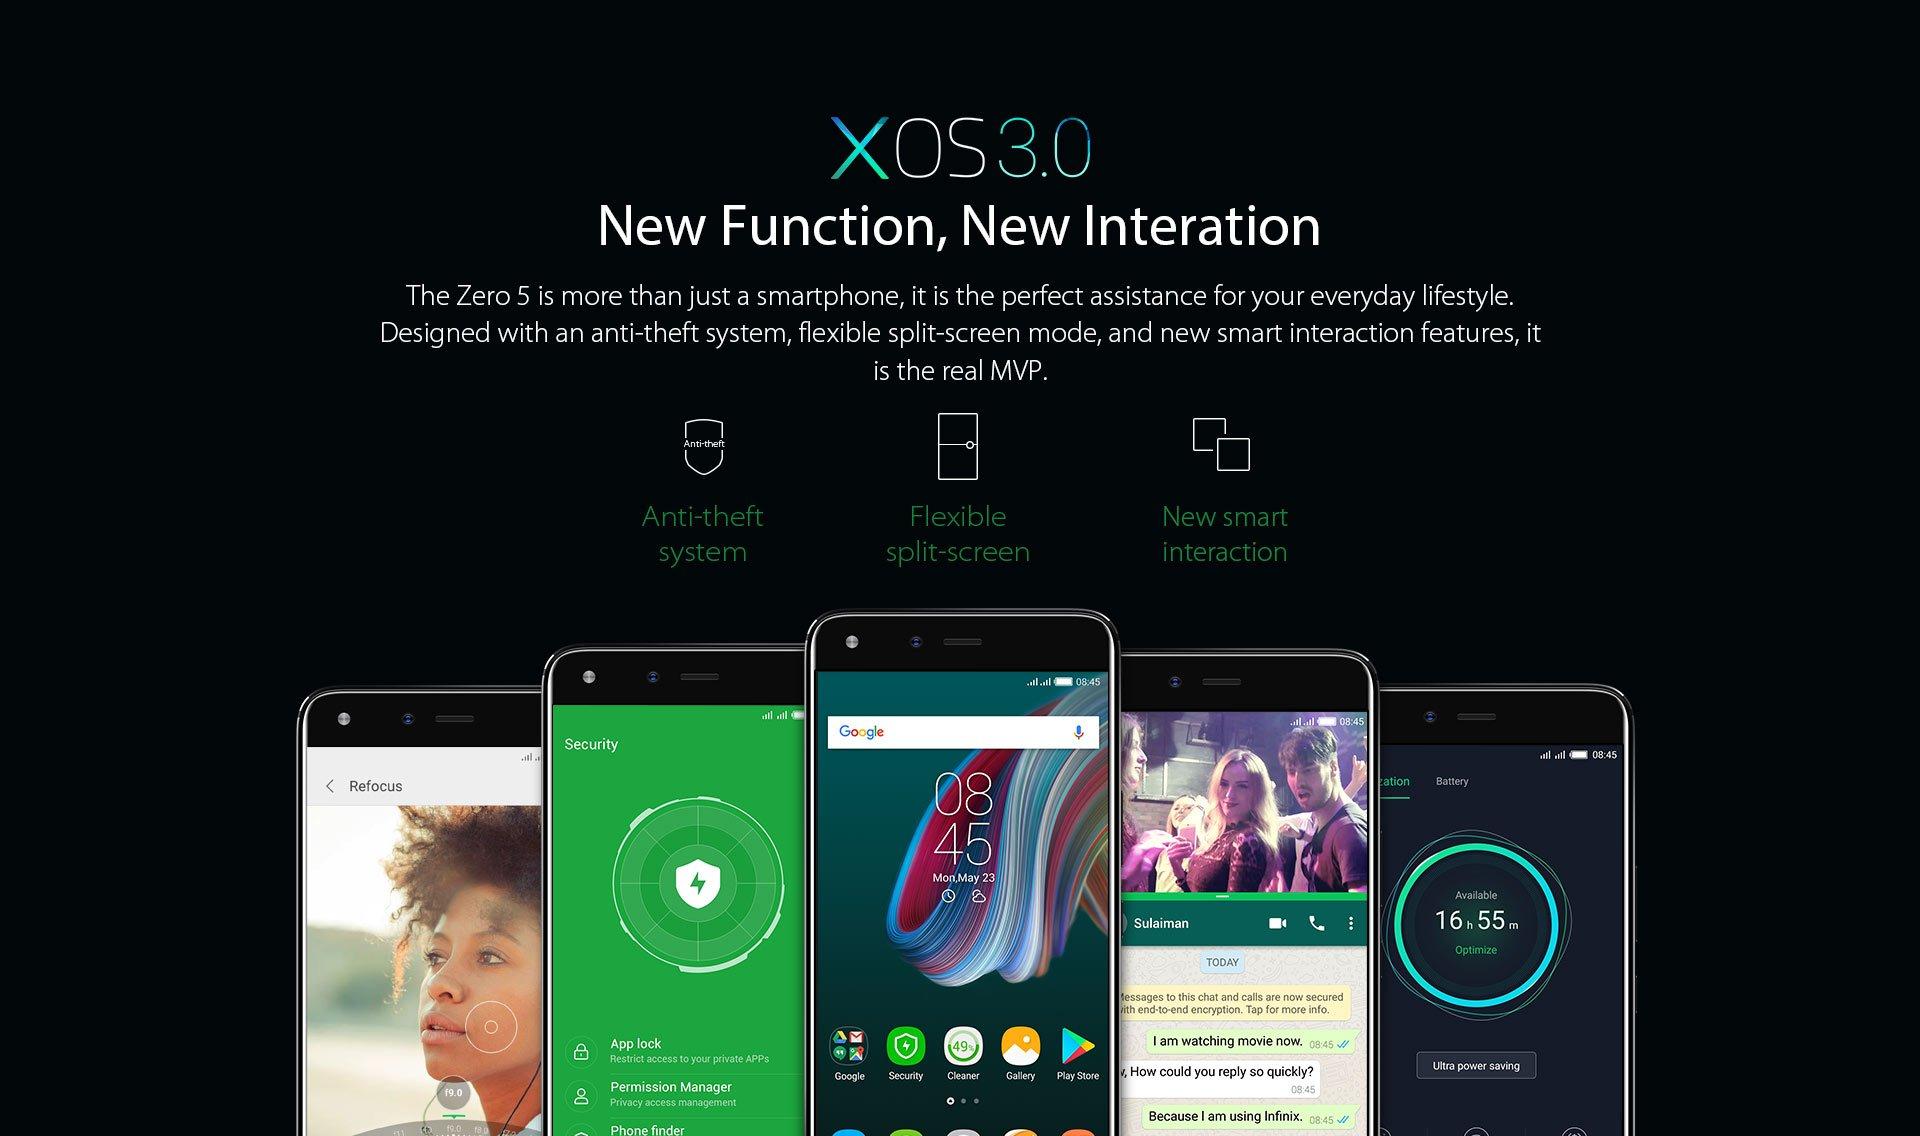 Infinix Zero5 features